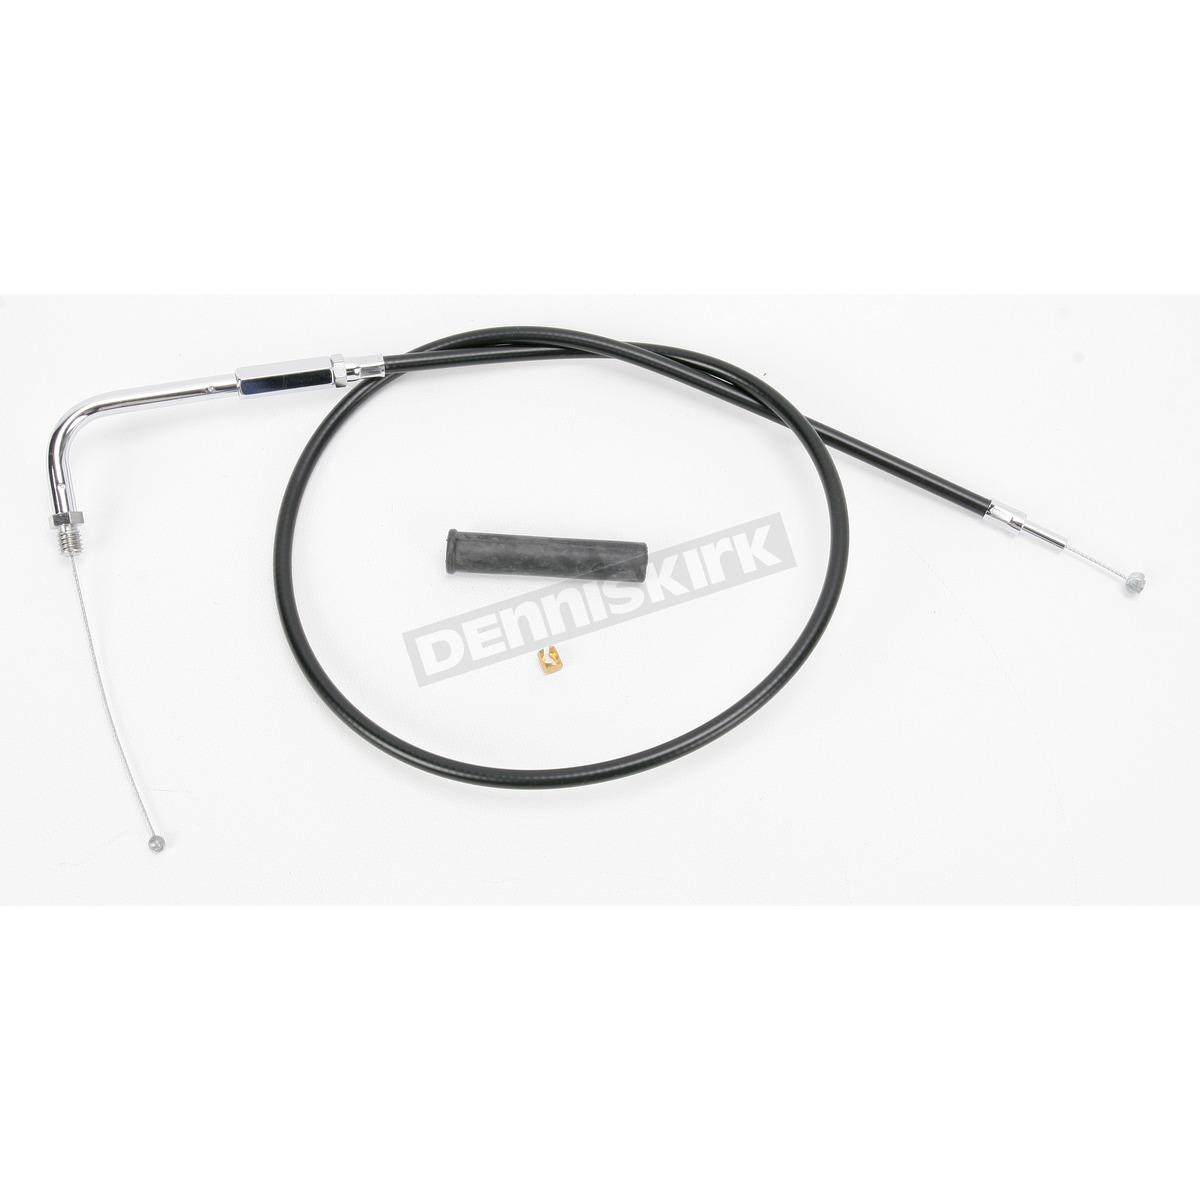 Drag Specialties Black Vinyl Throttle Cable w/90 Degree